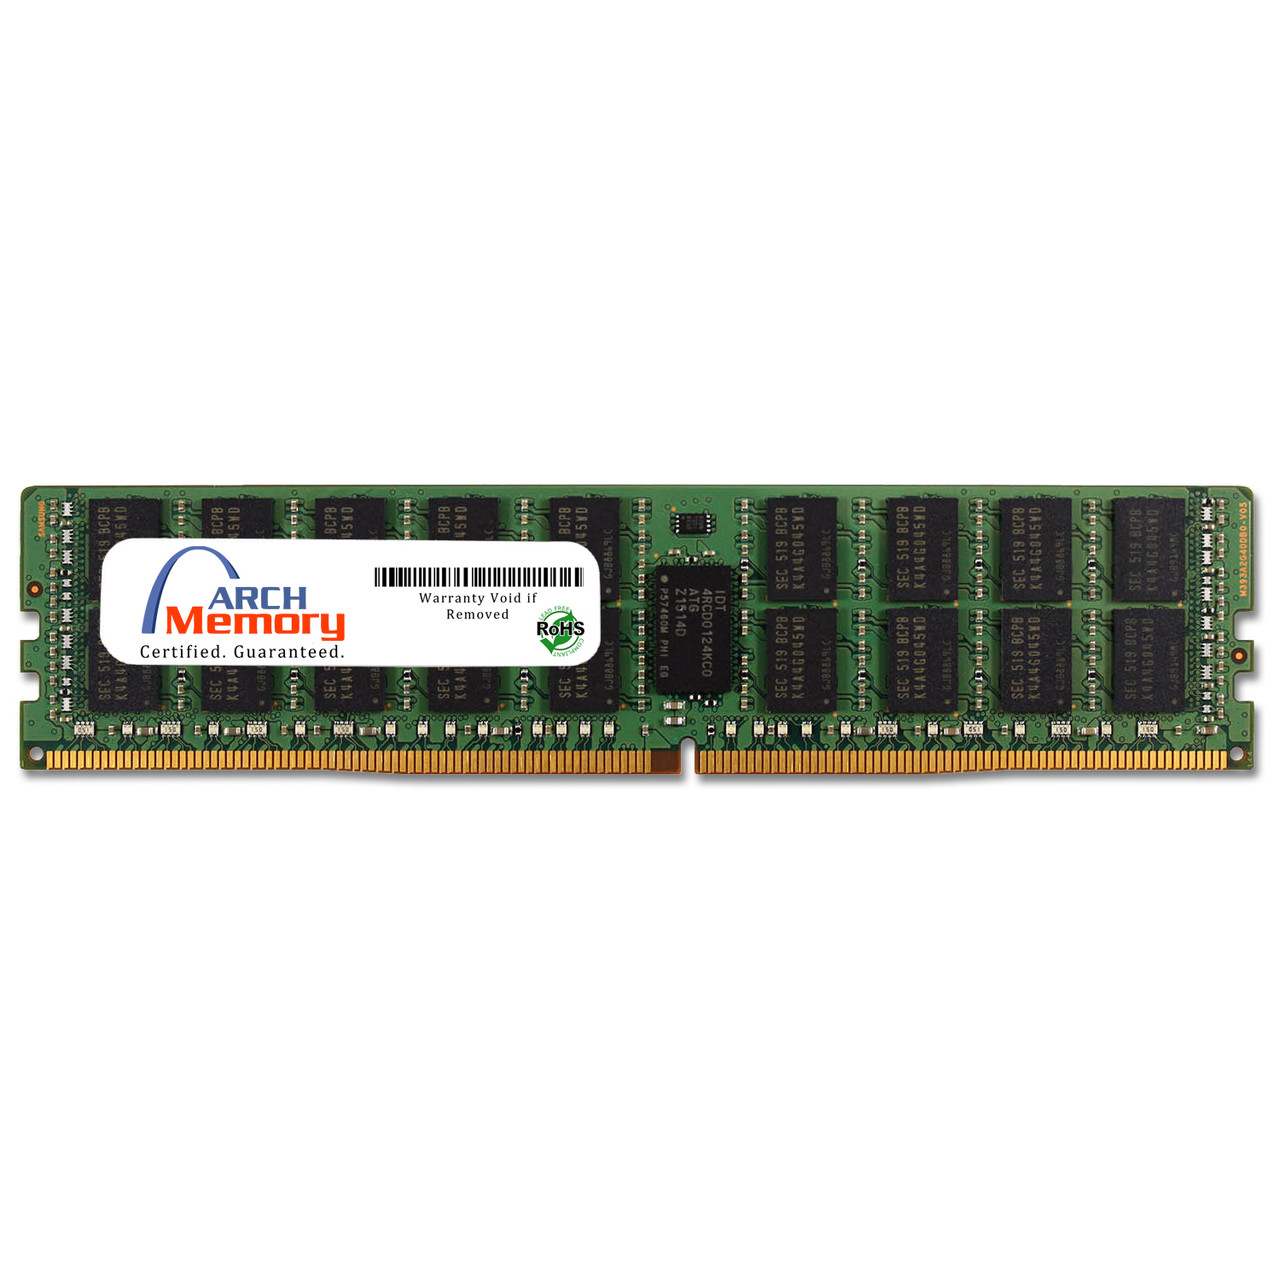 32GB DDR4-2400 PC4-19200 288 Pin ECC Registered Load Reduced RAM Memory